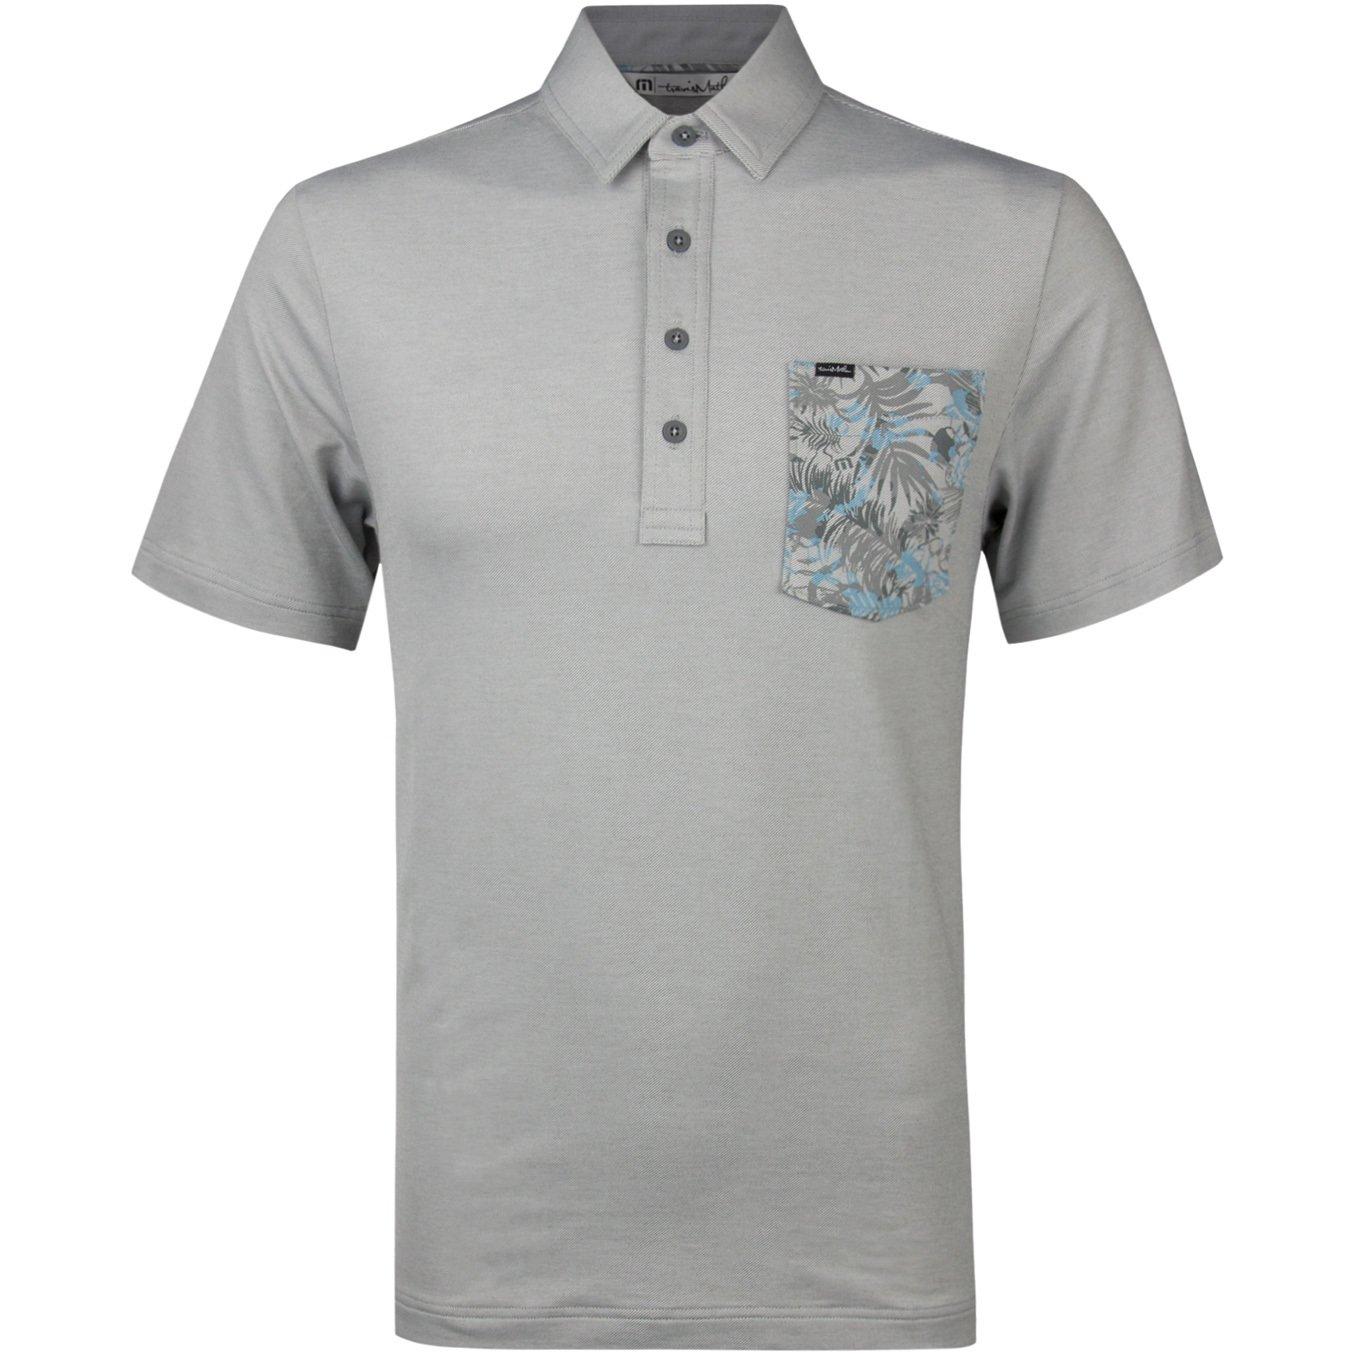 Designer Golf Shirts | Designer Golf Shirts Uk